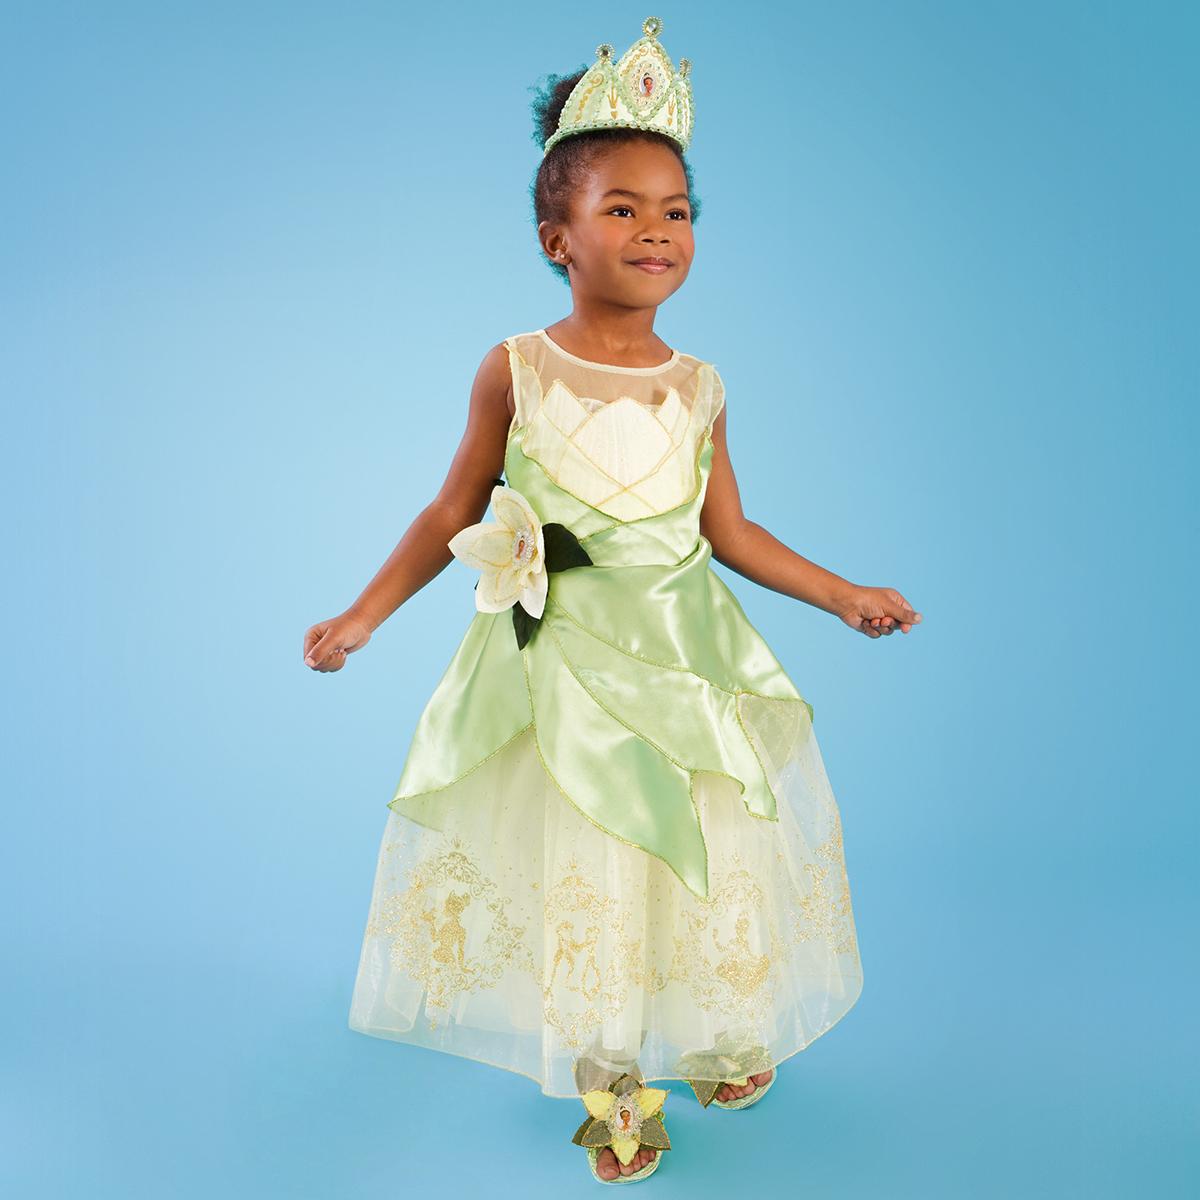 Princess Tiana Outfit: Disney Princess Costumes: Spring 2010